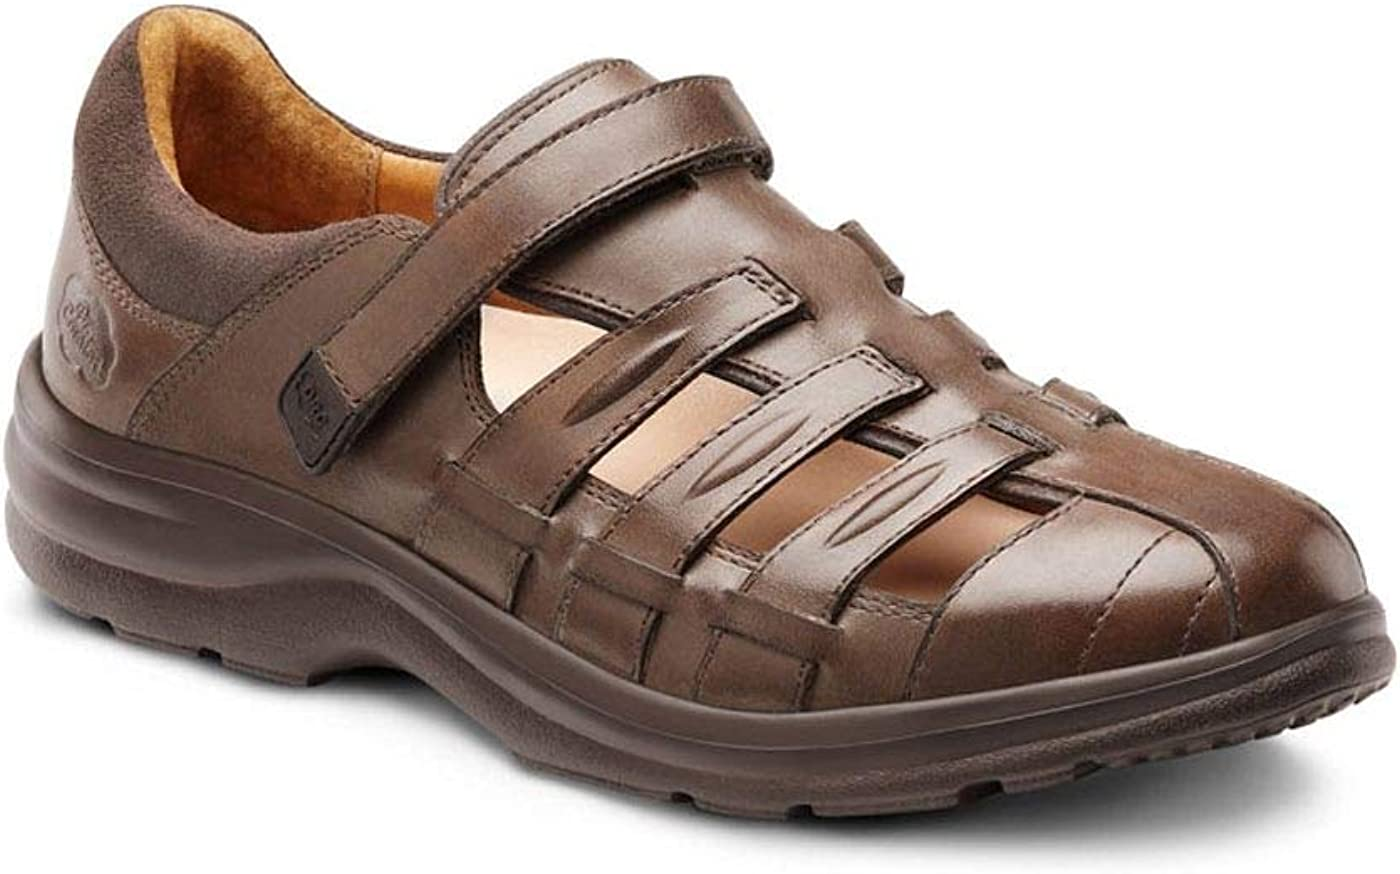 Direct store Dr. Max 48% OFF Comfort Women's Breeze Diabetic Fisherman Coff Style Sandal: